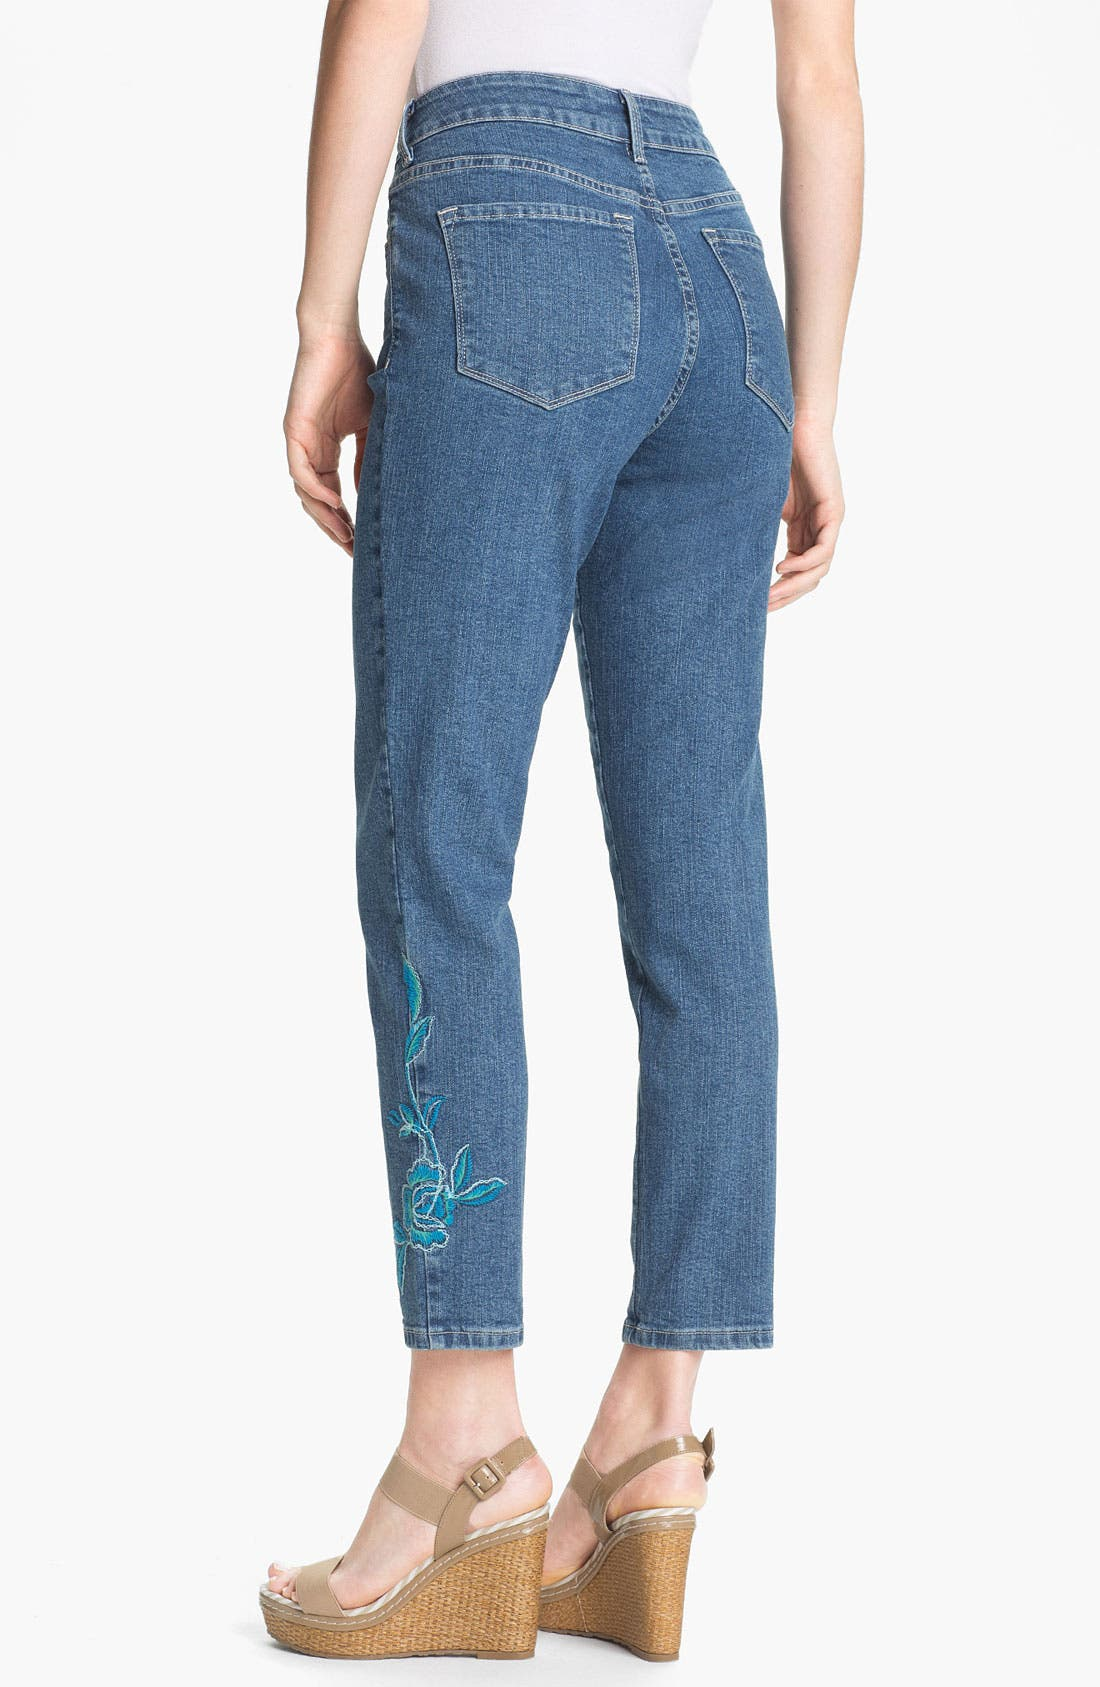 Alternate Image 2  - NYDJ 'Alisha' Embroidered Skinny Stretch Ankle Jeans